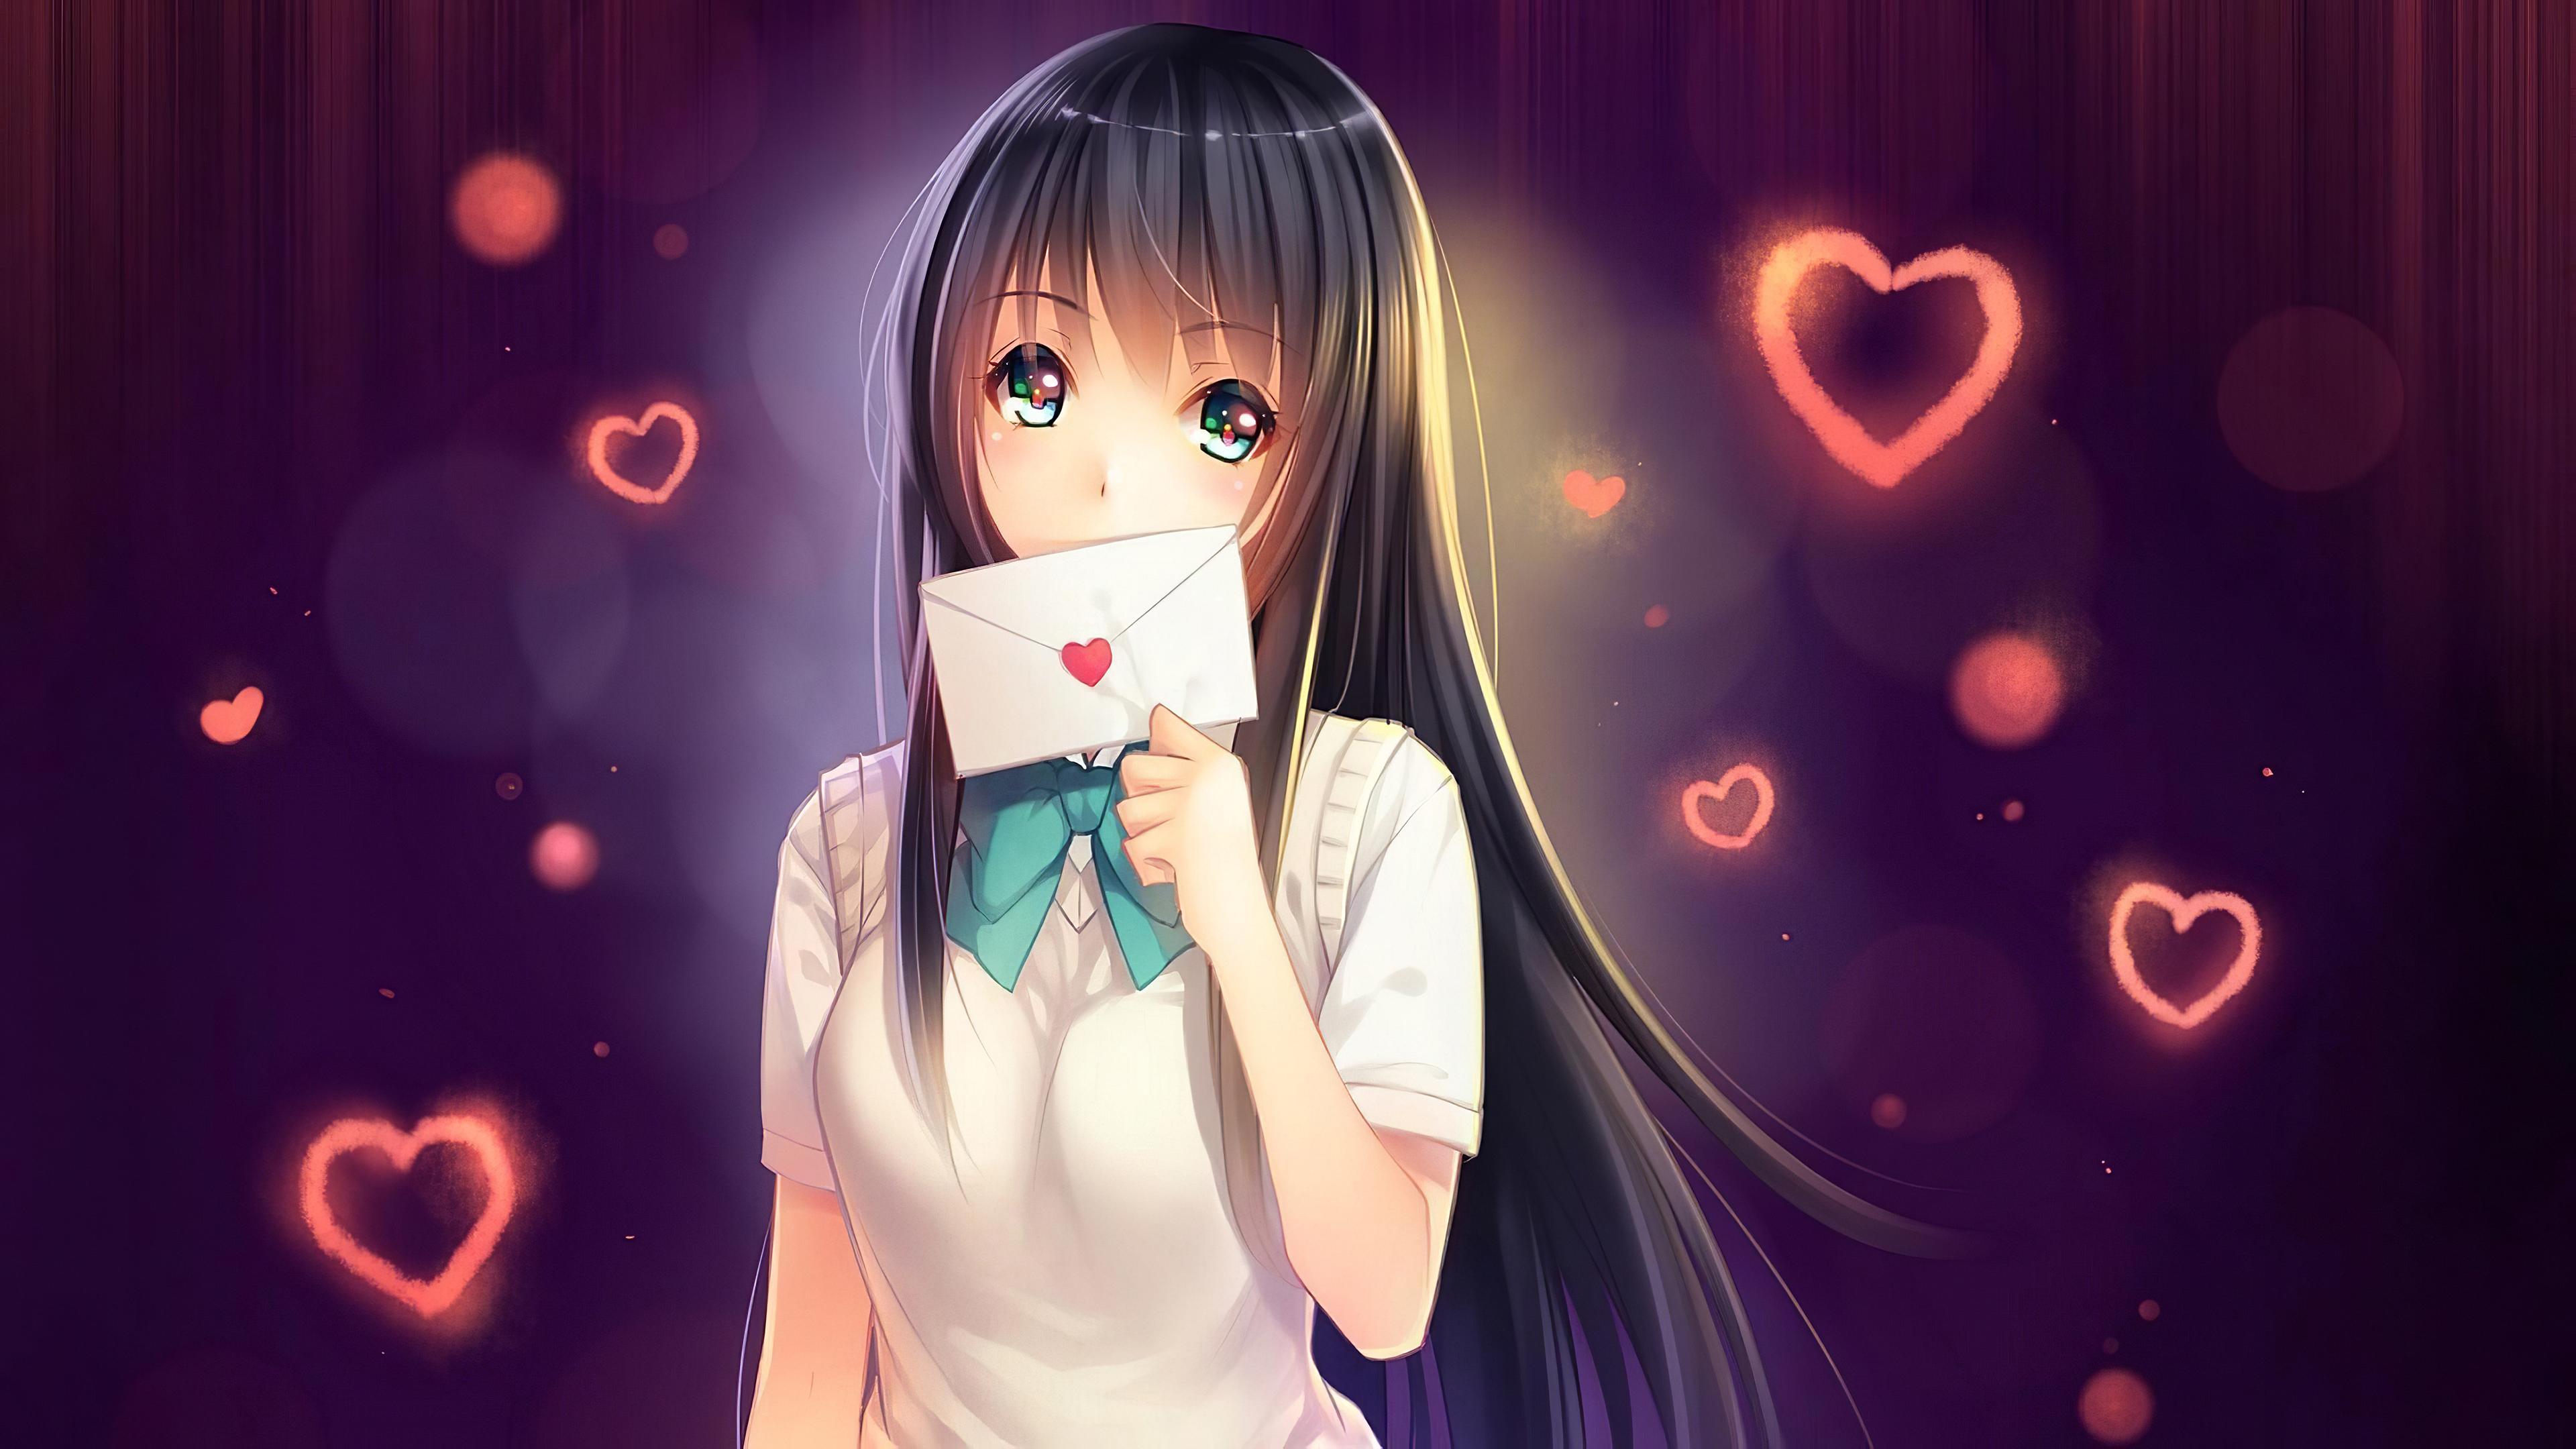 anime girl in love with love letter 1578254402 - Anime Girl In Love With Love Letter -